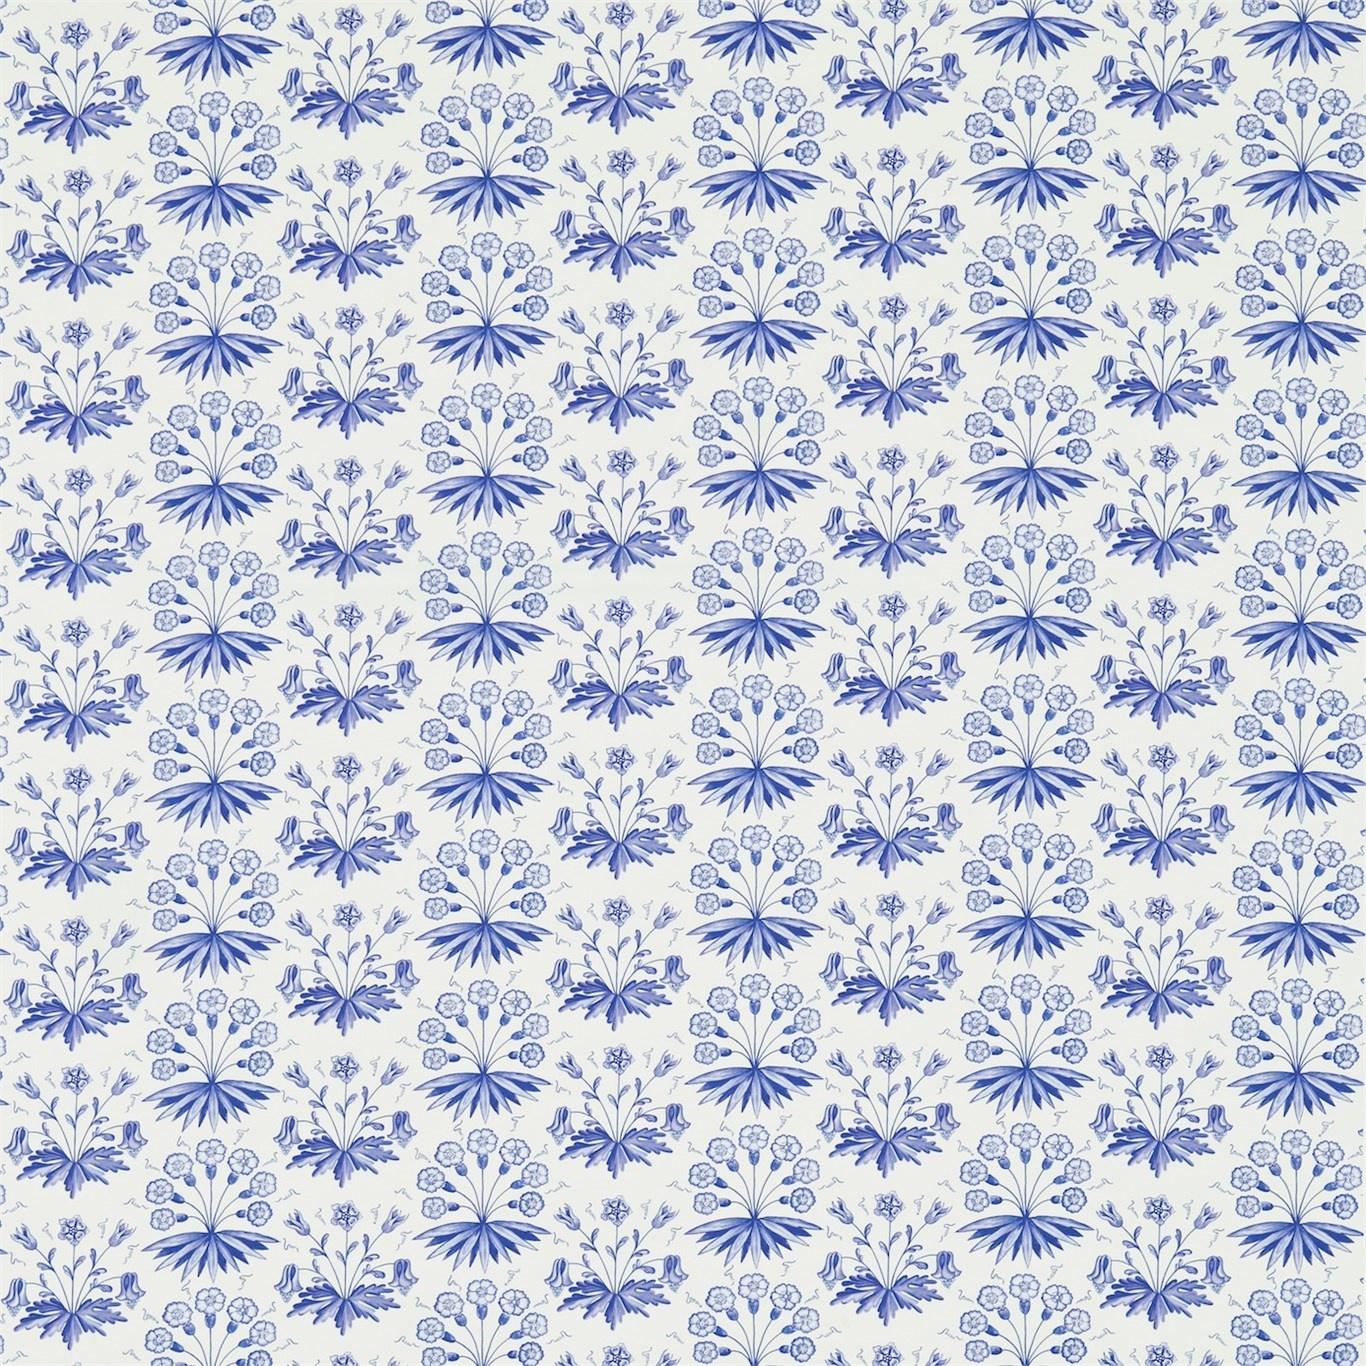 Image of Morris & Co Primrose & Columbine Delft Blue Curtain Fabric 224483